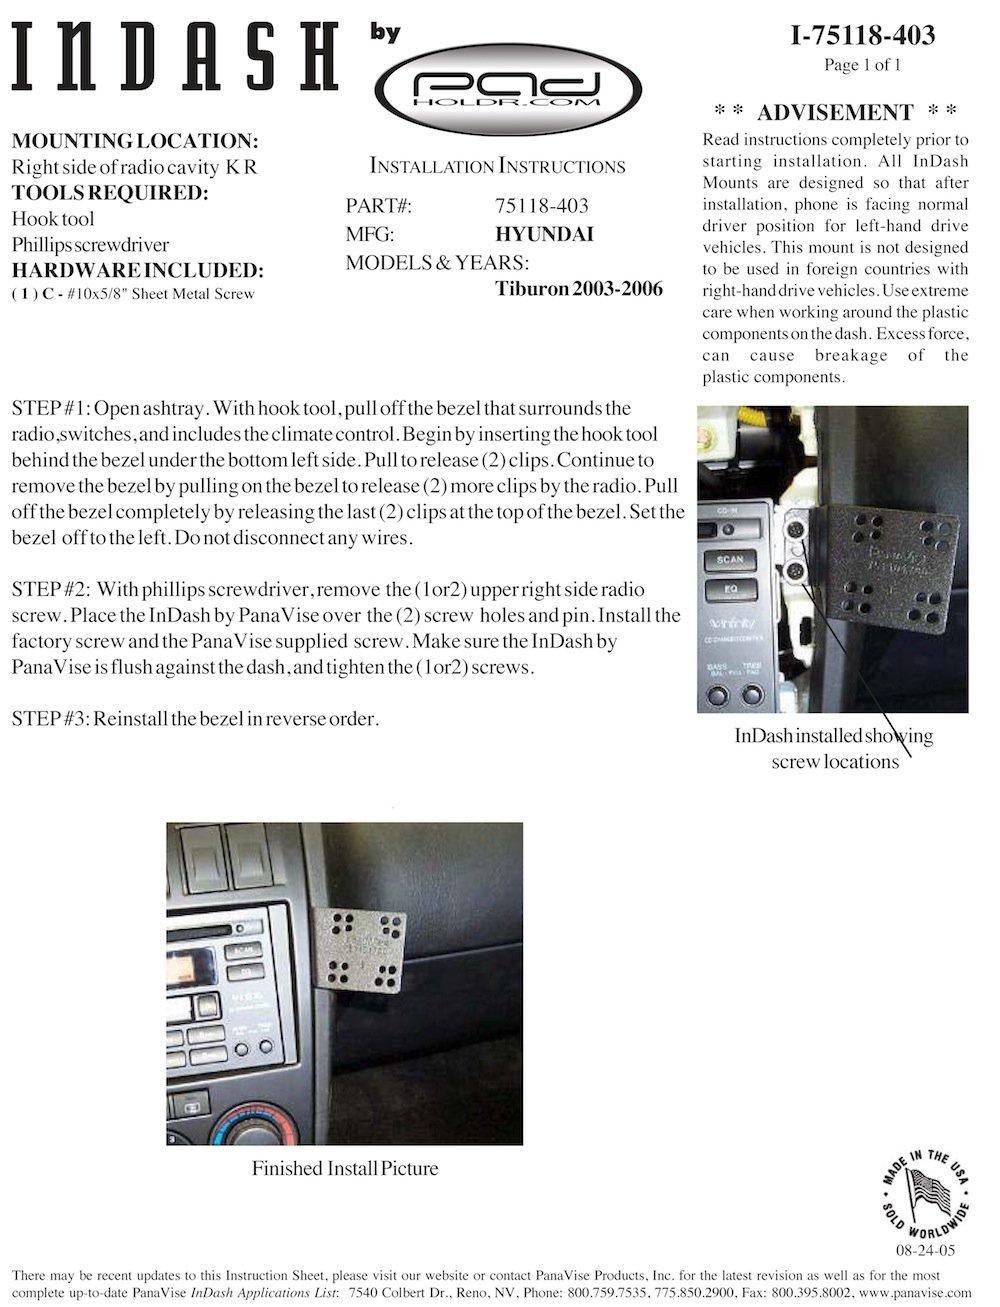 Padholdr Ram Lock Series Lock and Dock iPad Dash Kit for 2003-2006 Hyundai Tiburon Pad Holdr PHRLD3275118-403